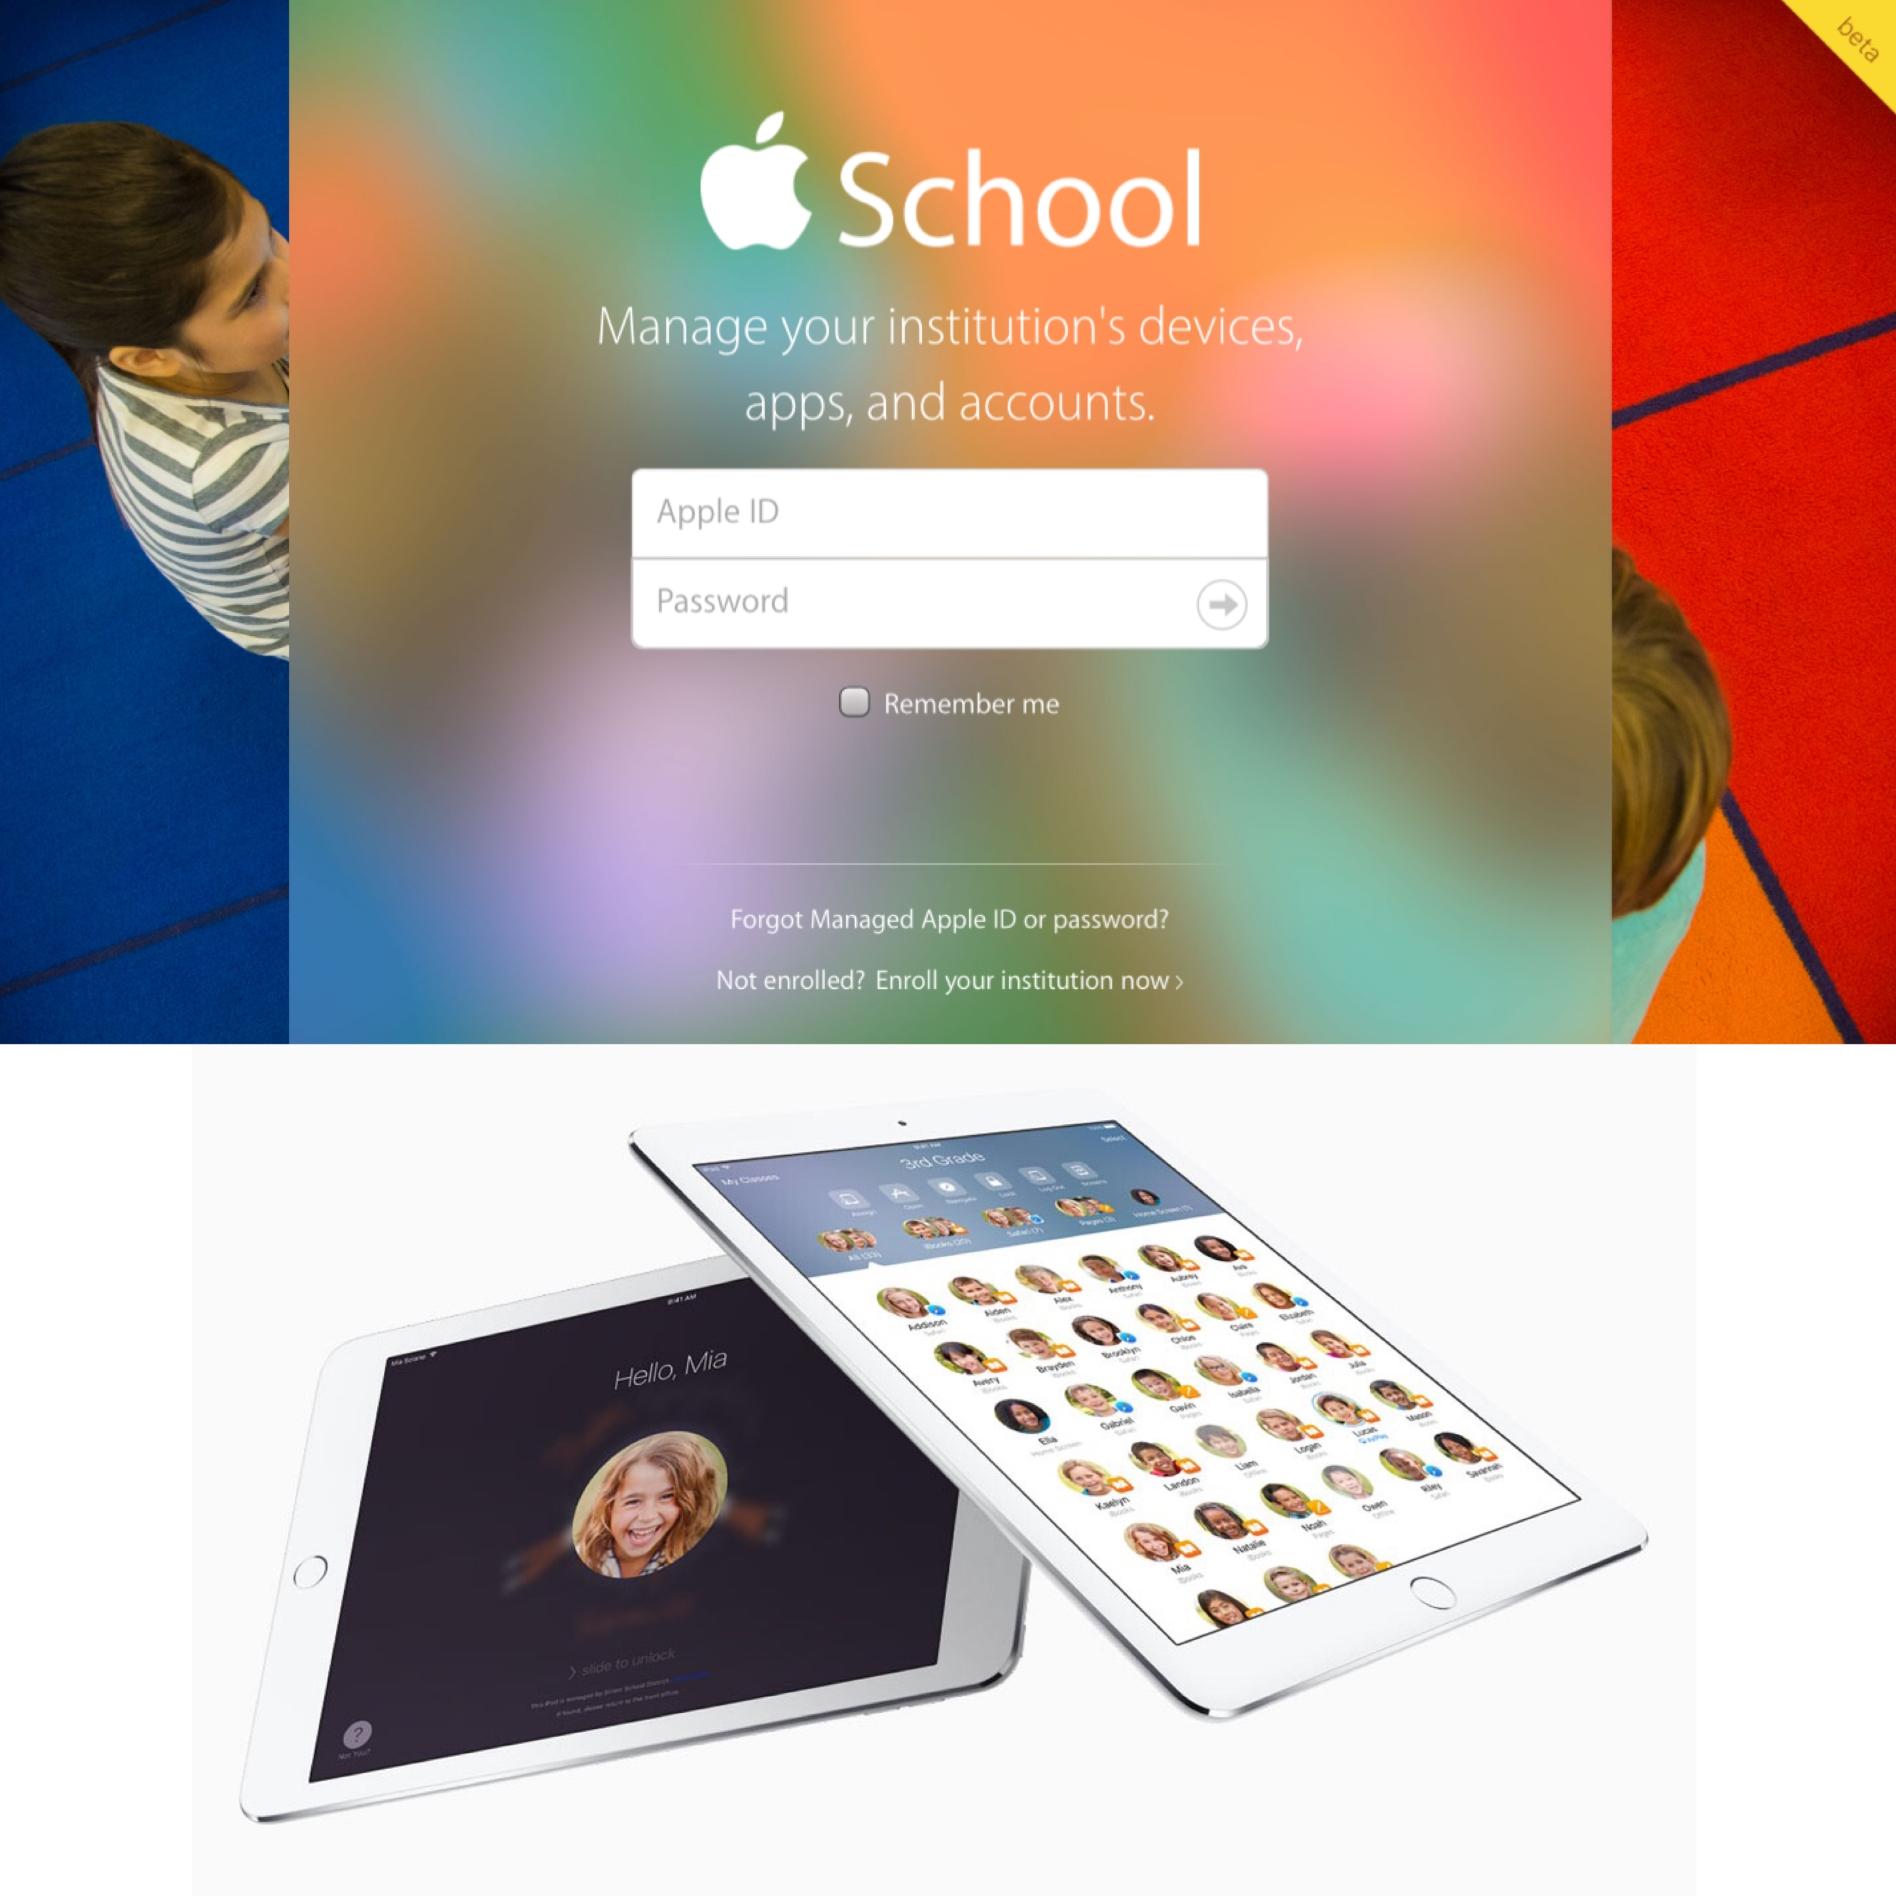 school-apple-ipad